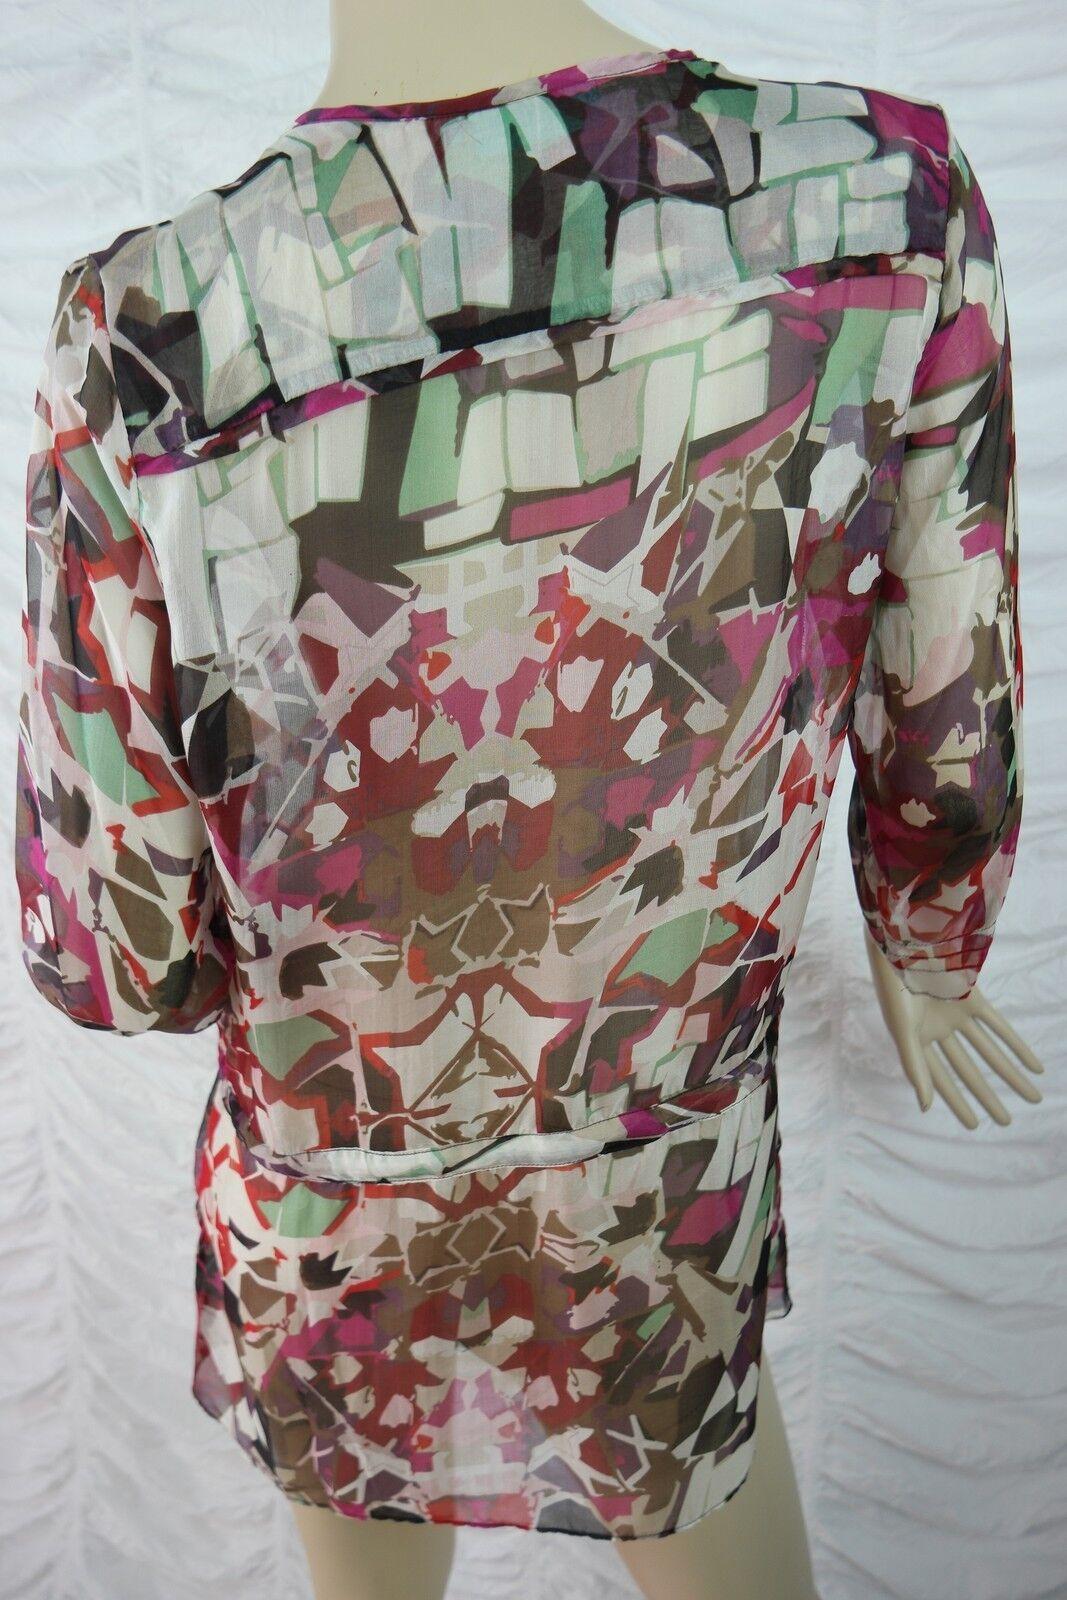 Blau ILLUSION silk lila geometric print 100% silk ILLUSION kaftan blouse Größe XS NWOT fb8726